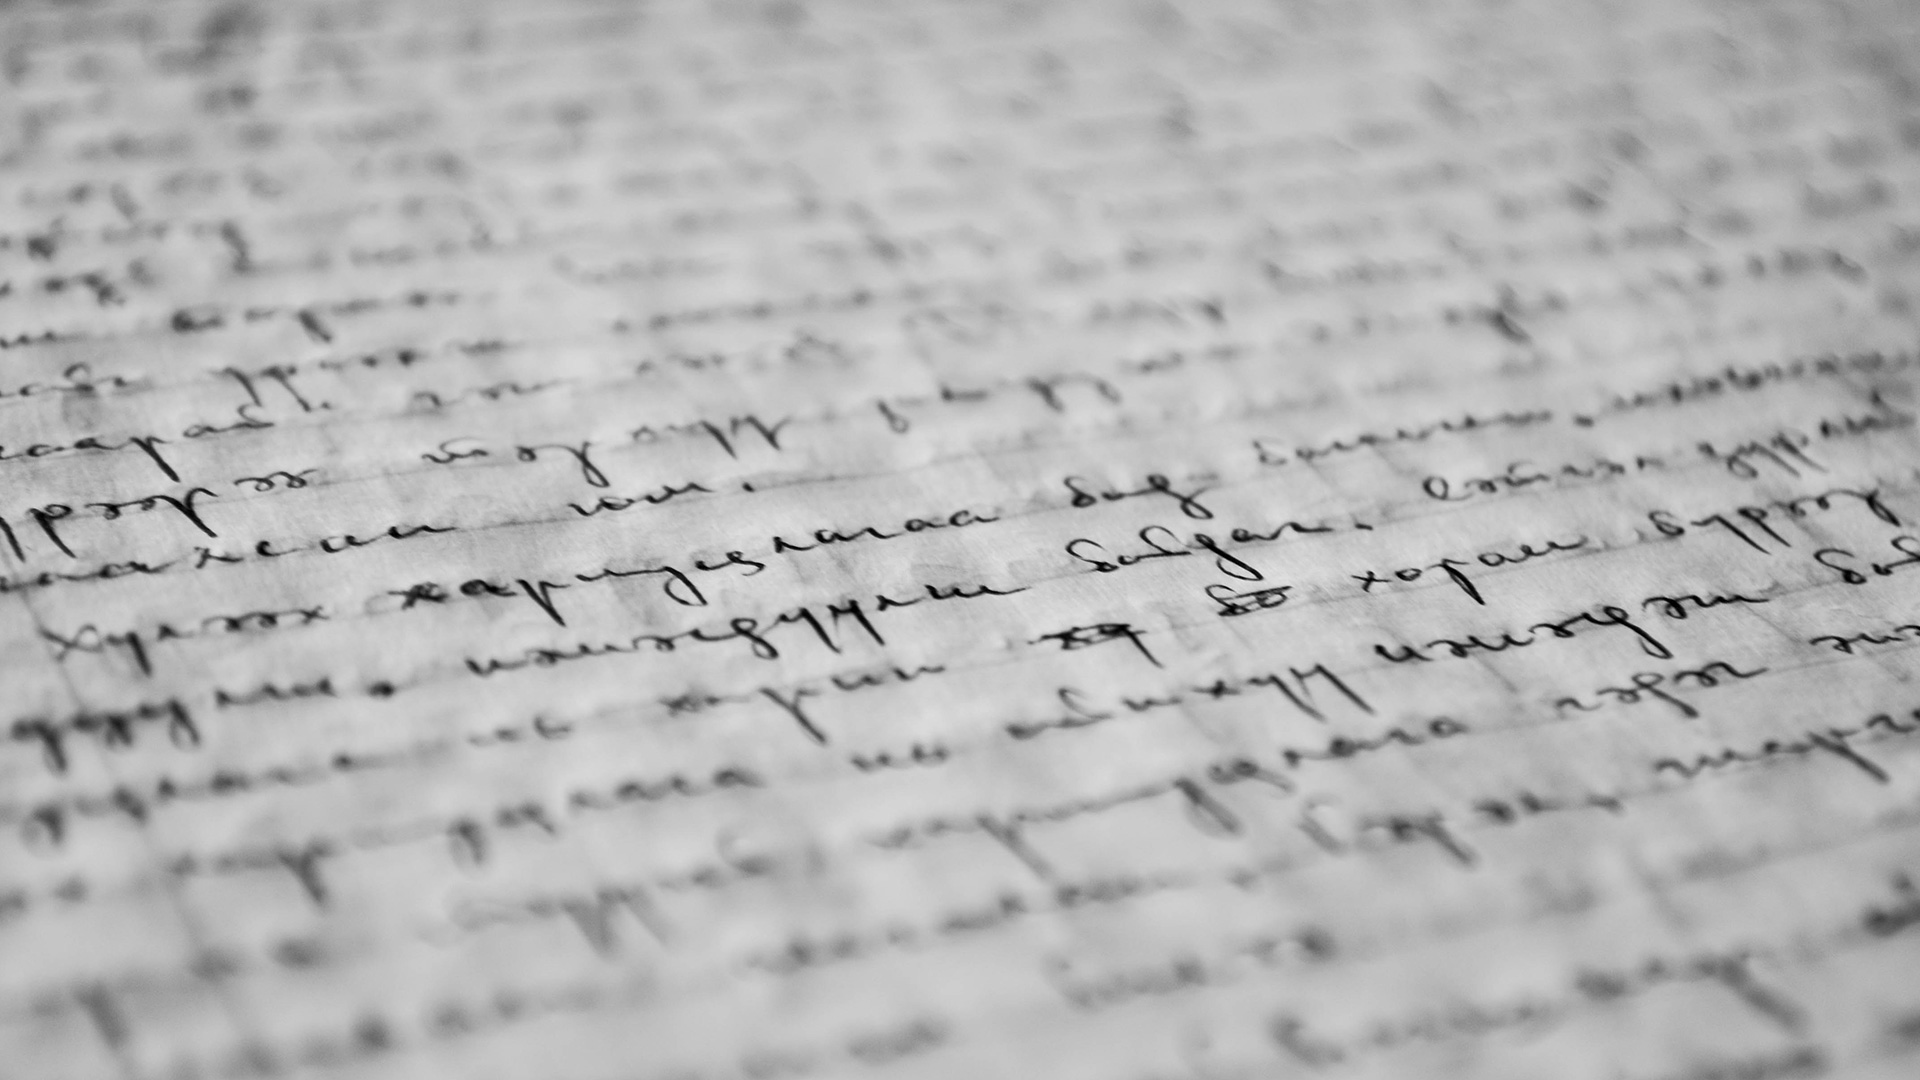 Bina-Qurani-Ciri-Teks-Deskripsi